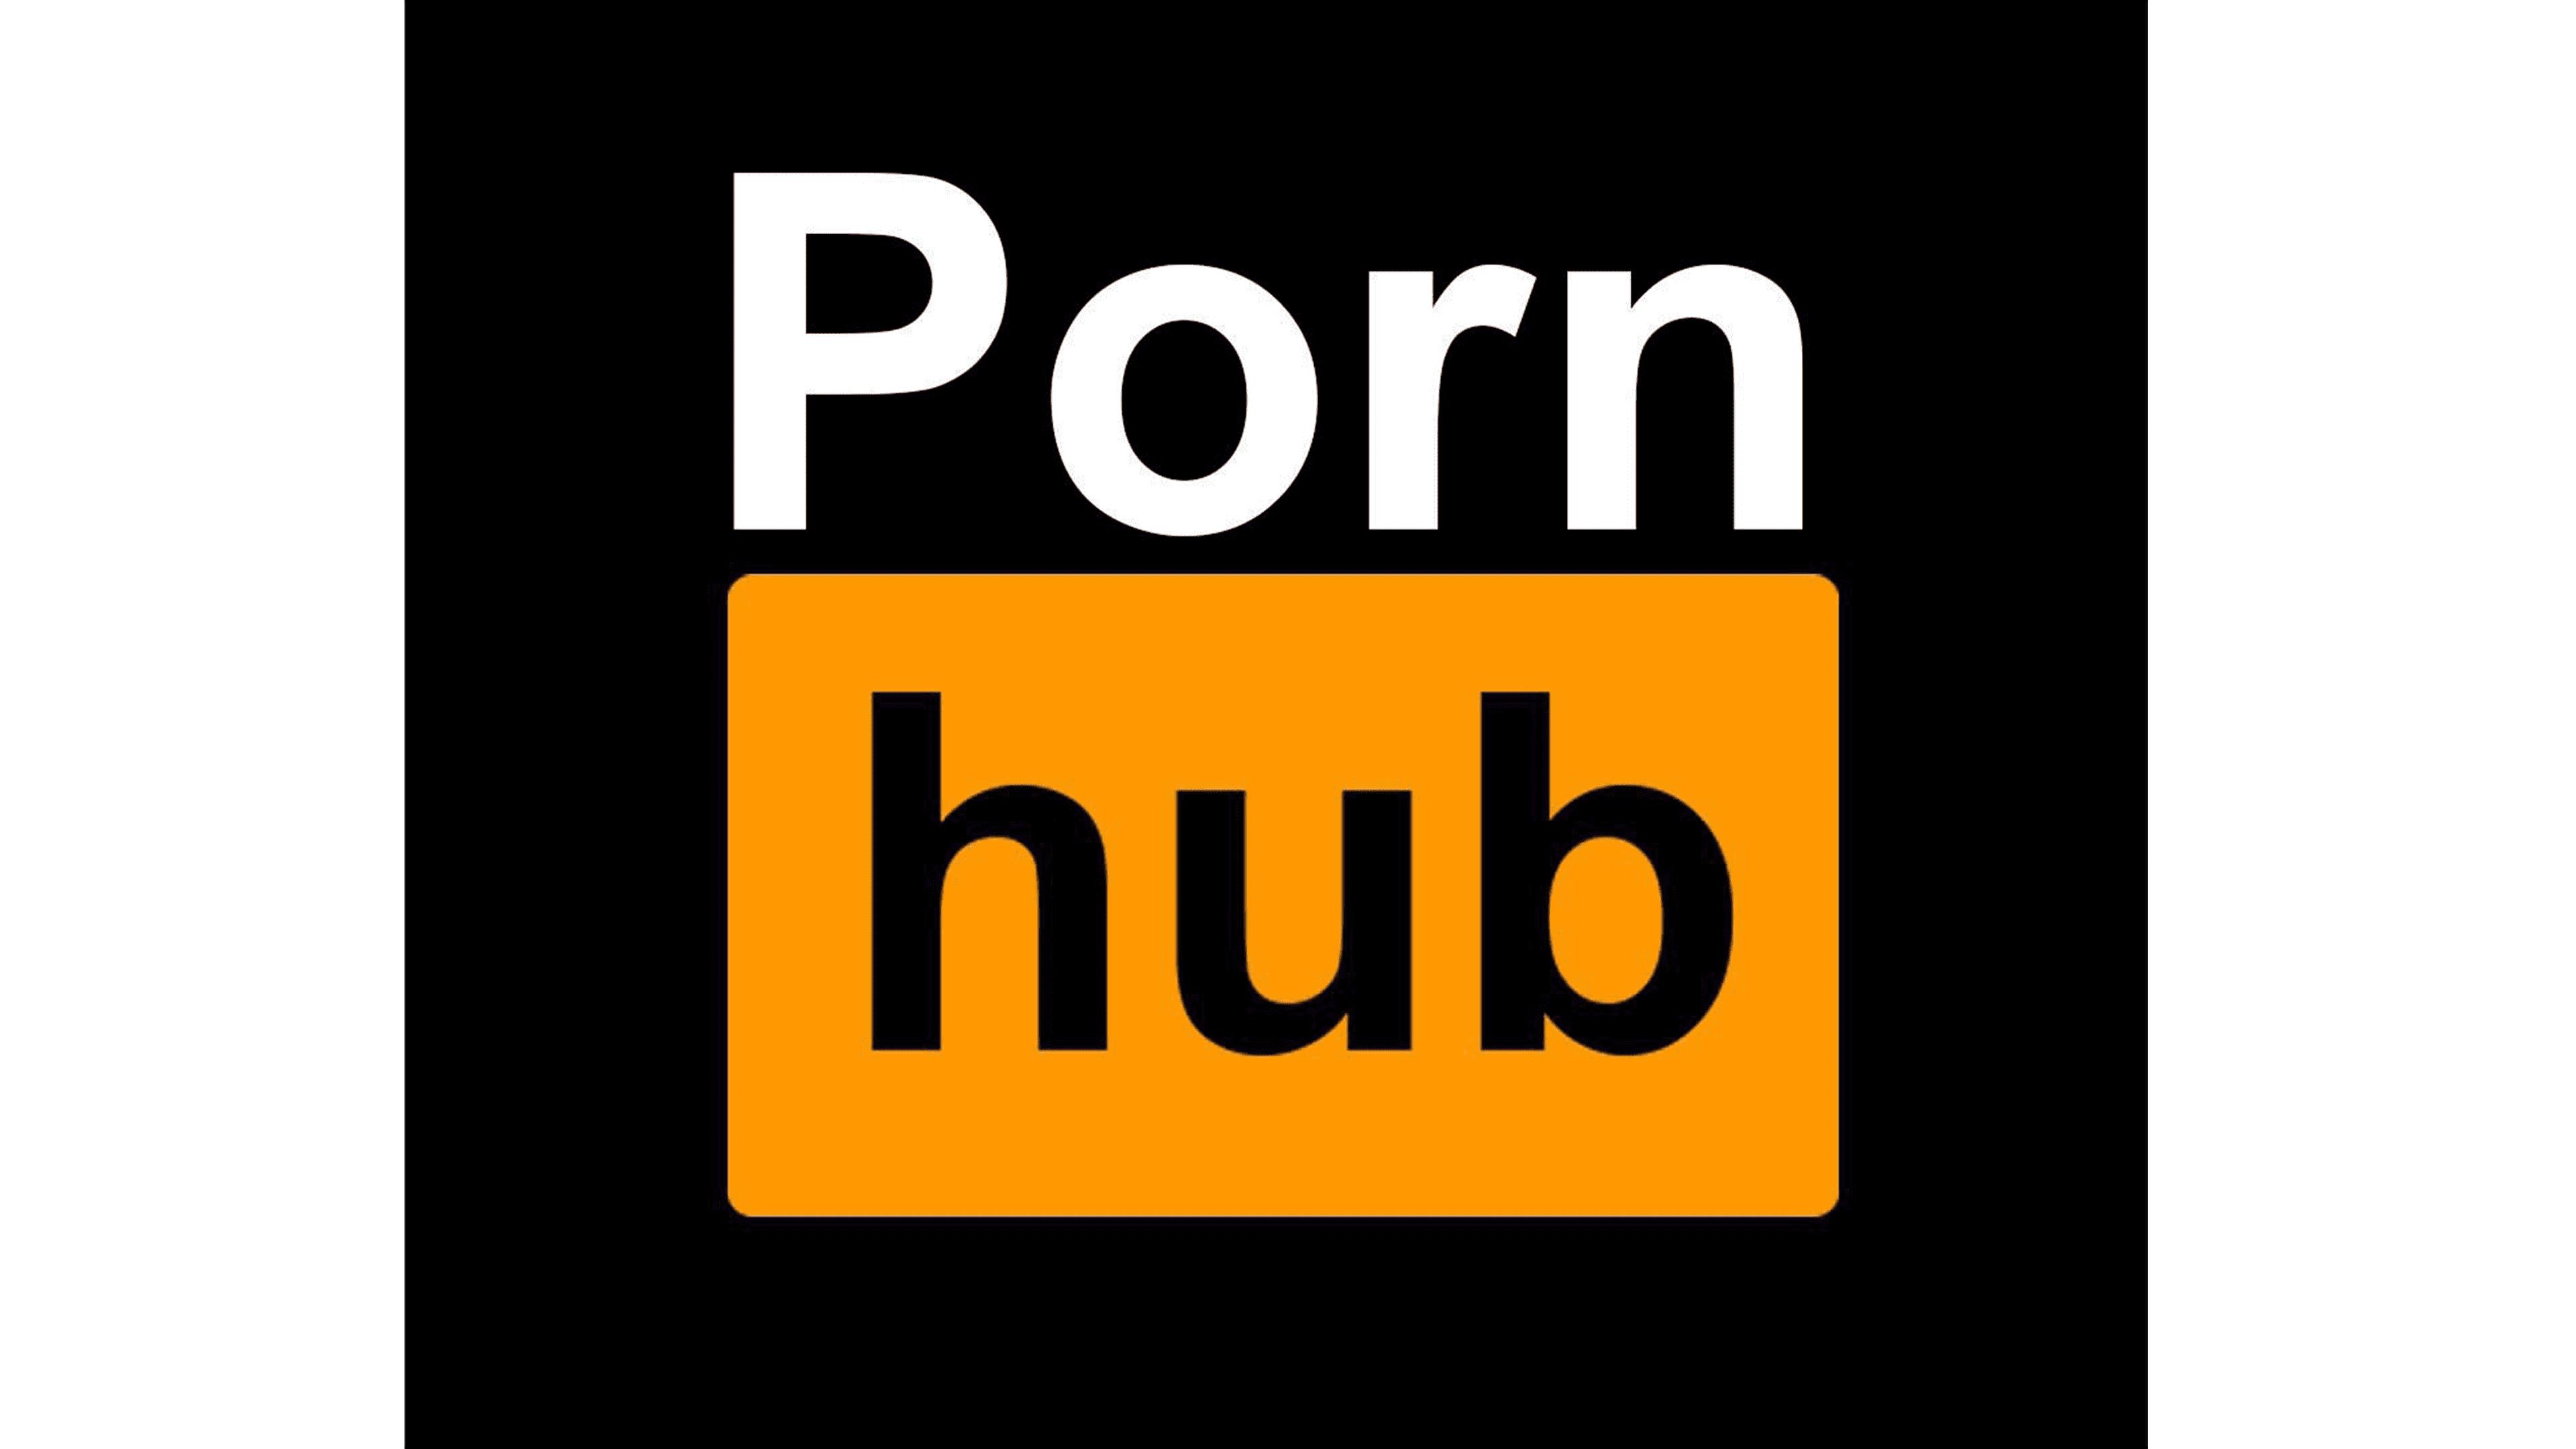 Pornhub symbol